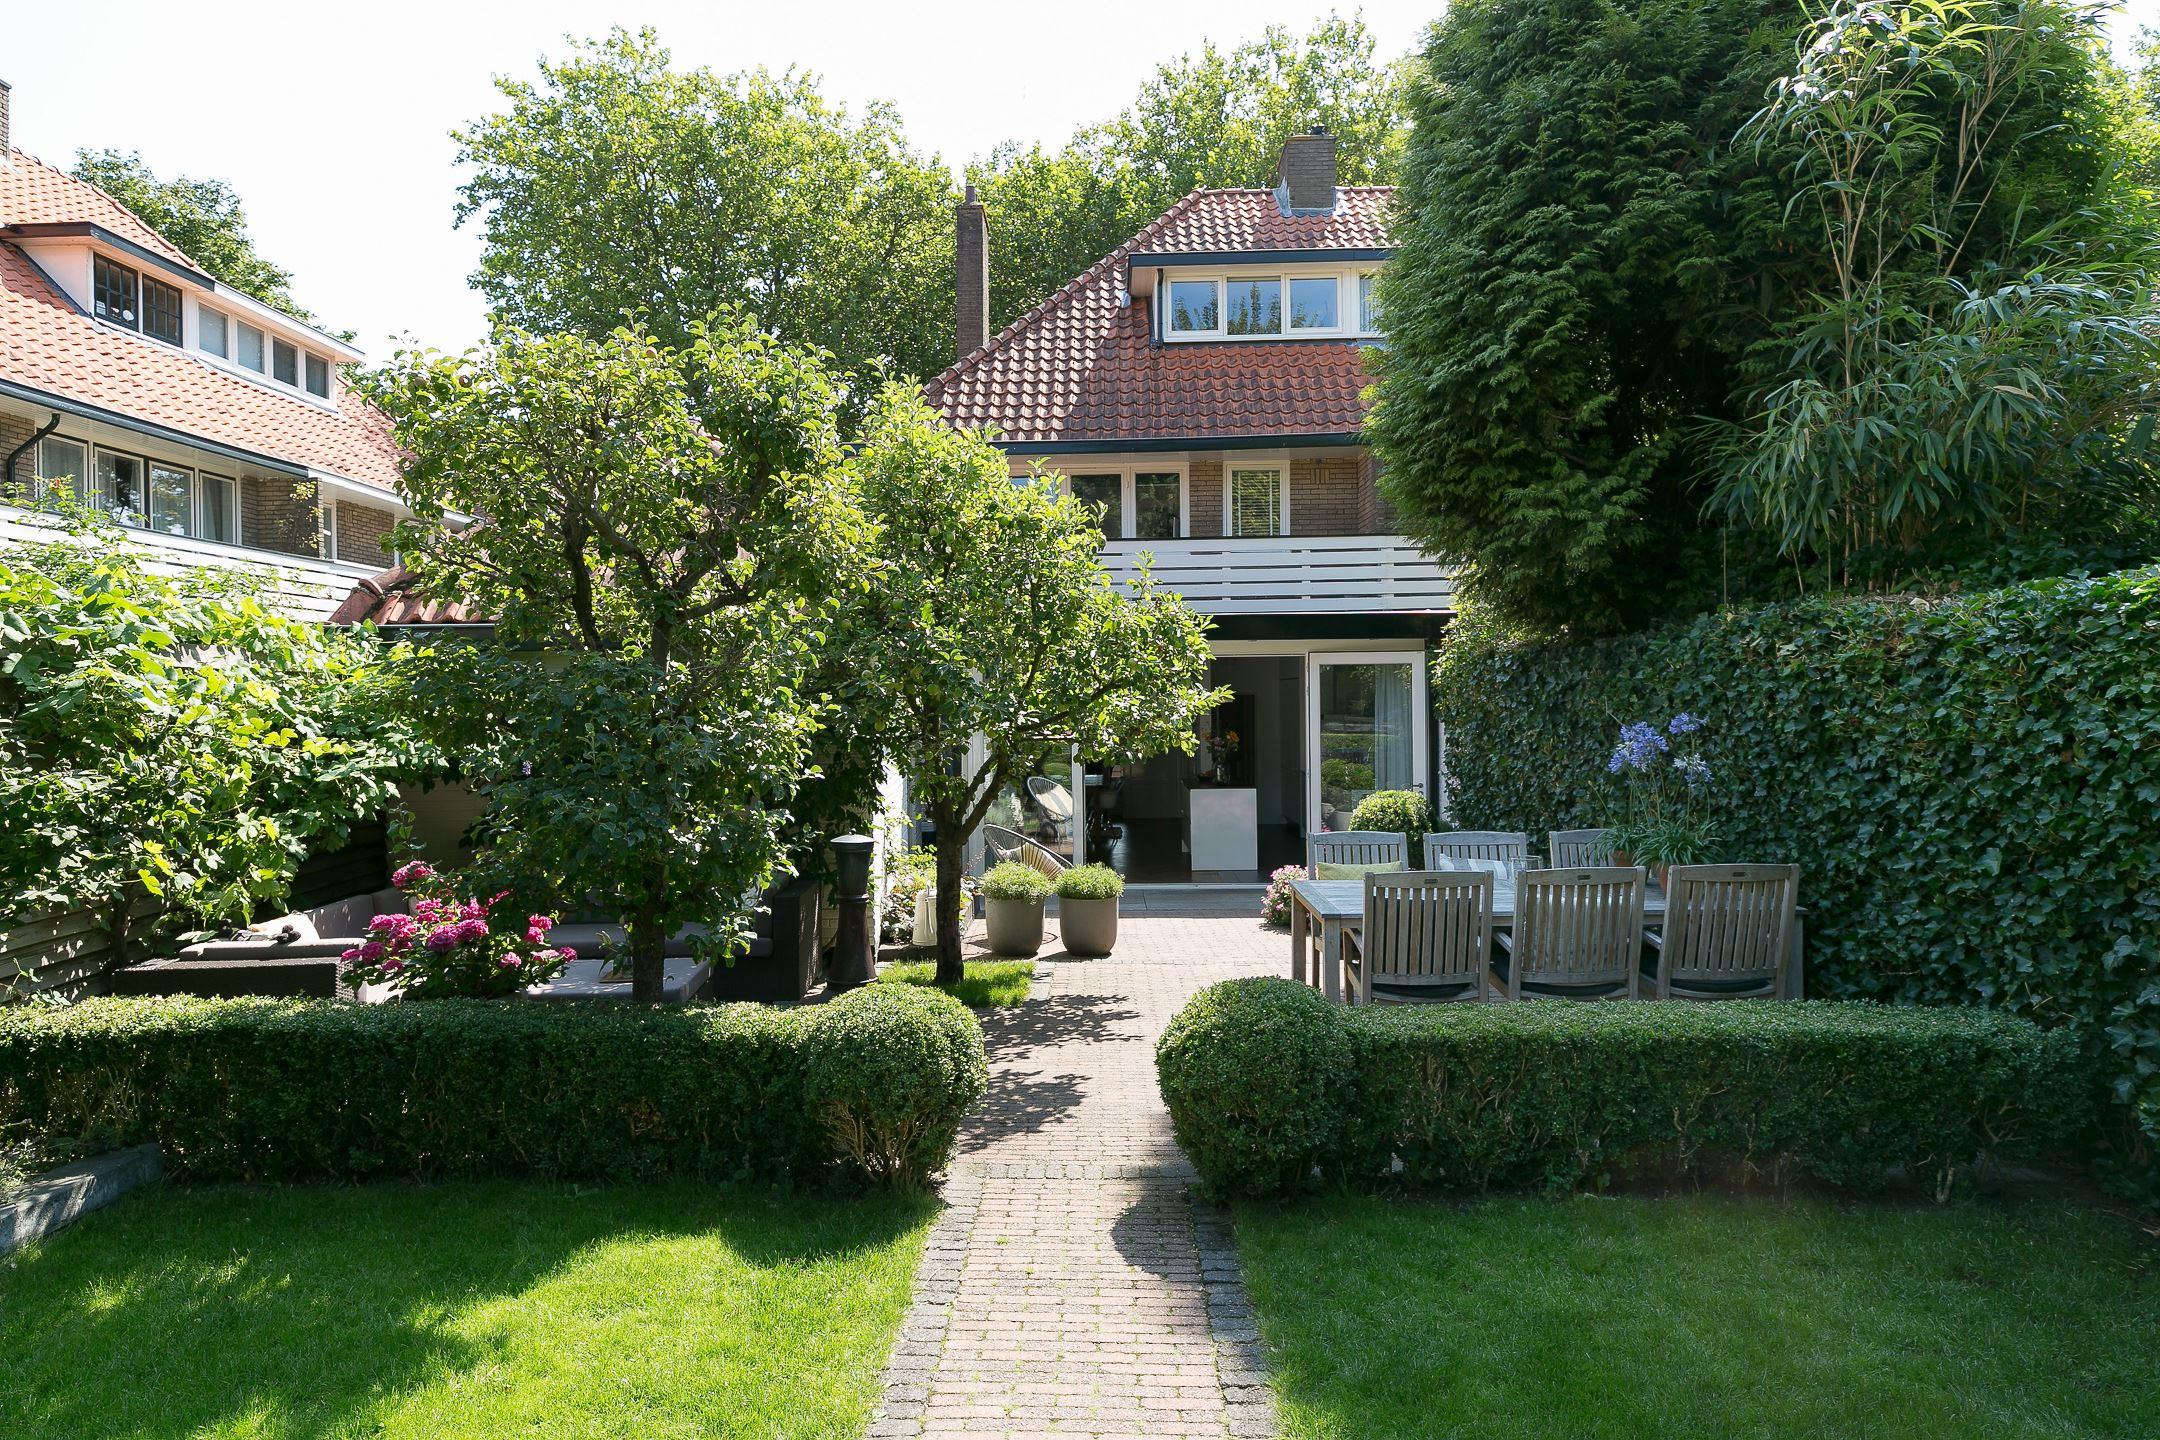 Huis te koop eikbosserweg 220 1213 sc hilversum funda for Huis hilversum